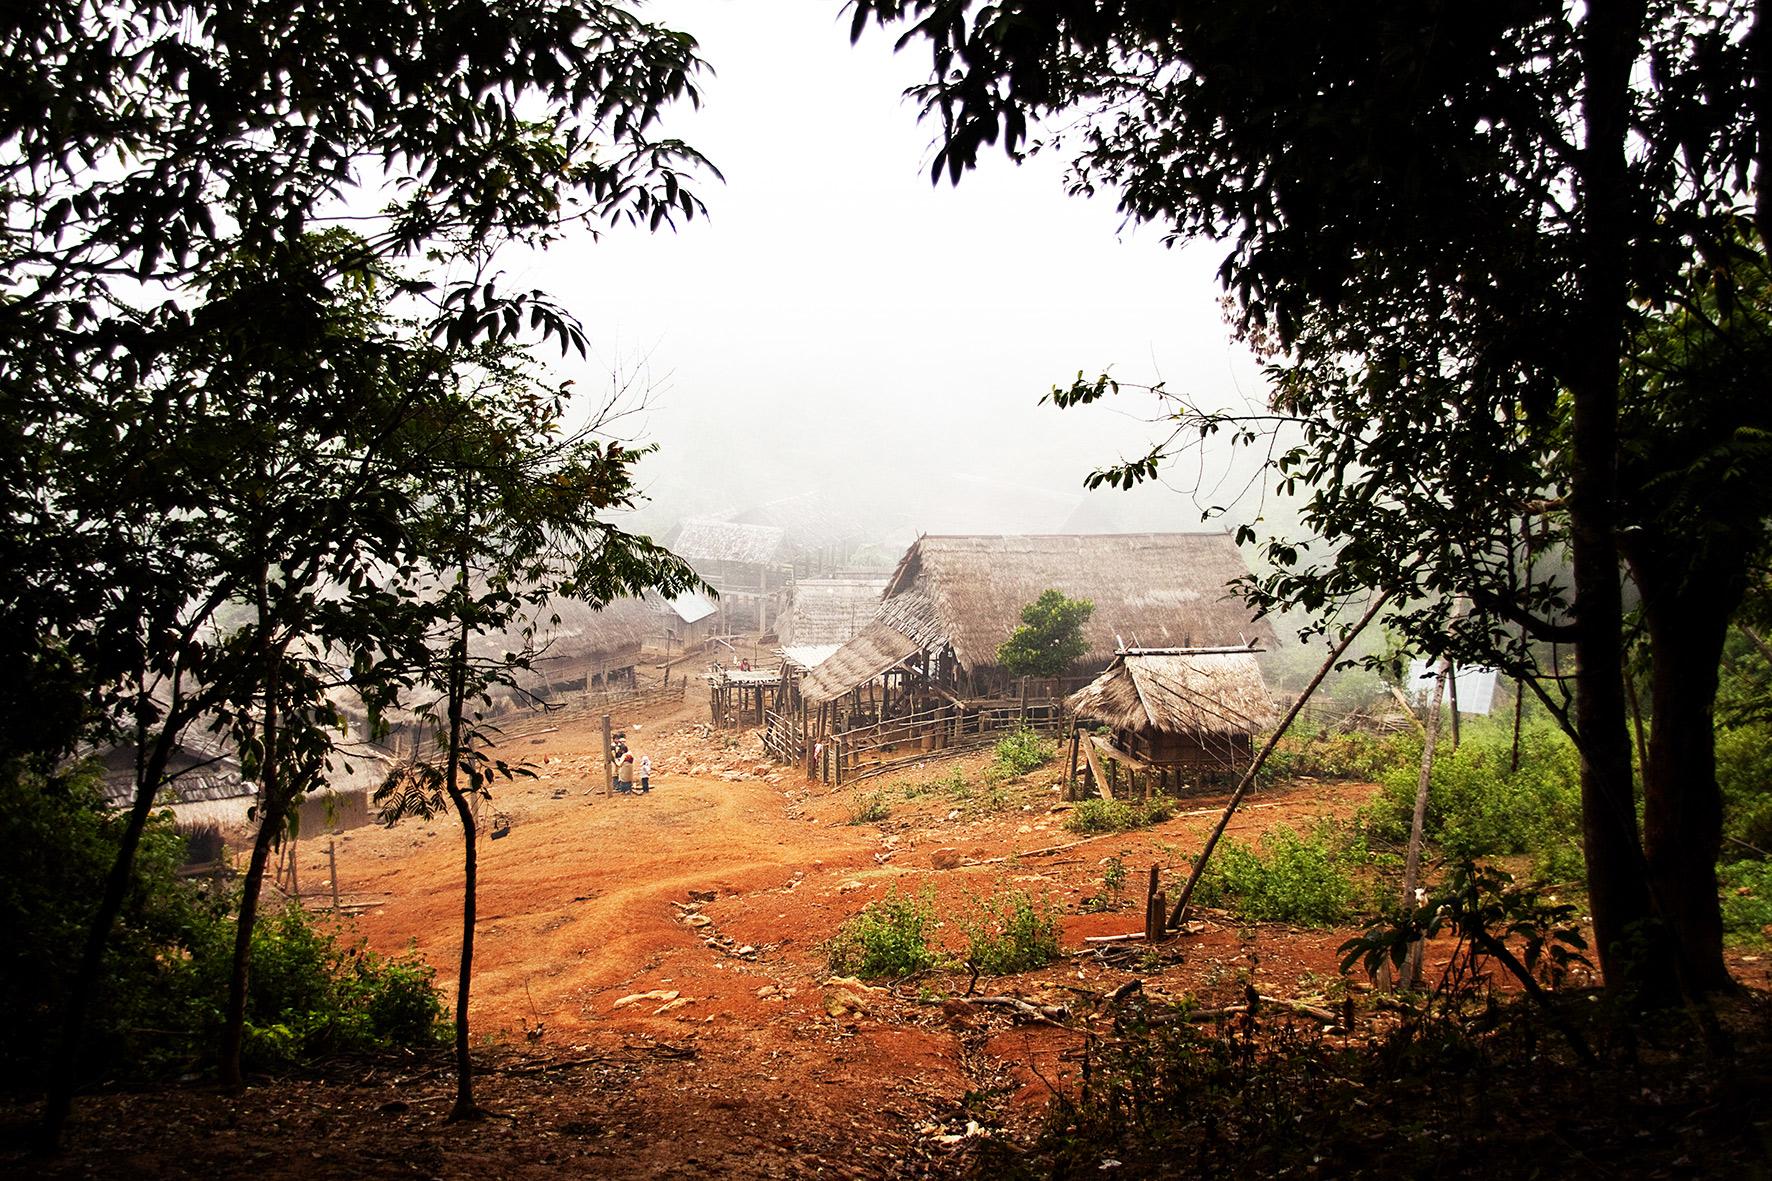 Laos, Muang Sing. 2009